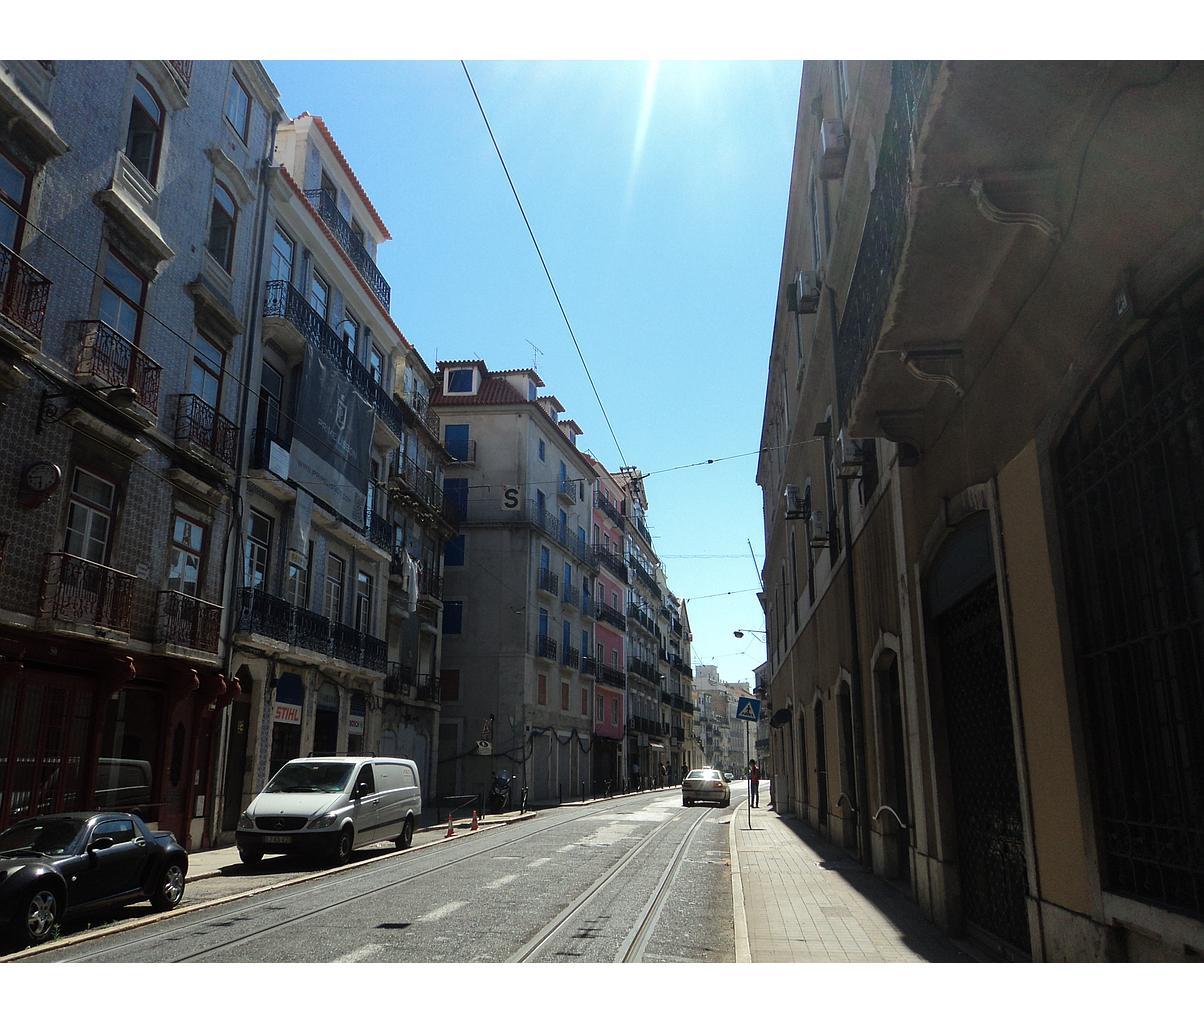 PF09252, Prédio, Lisboa